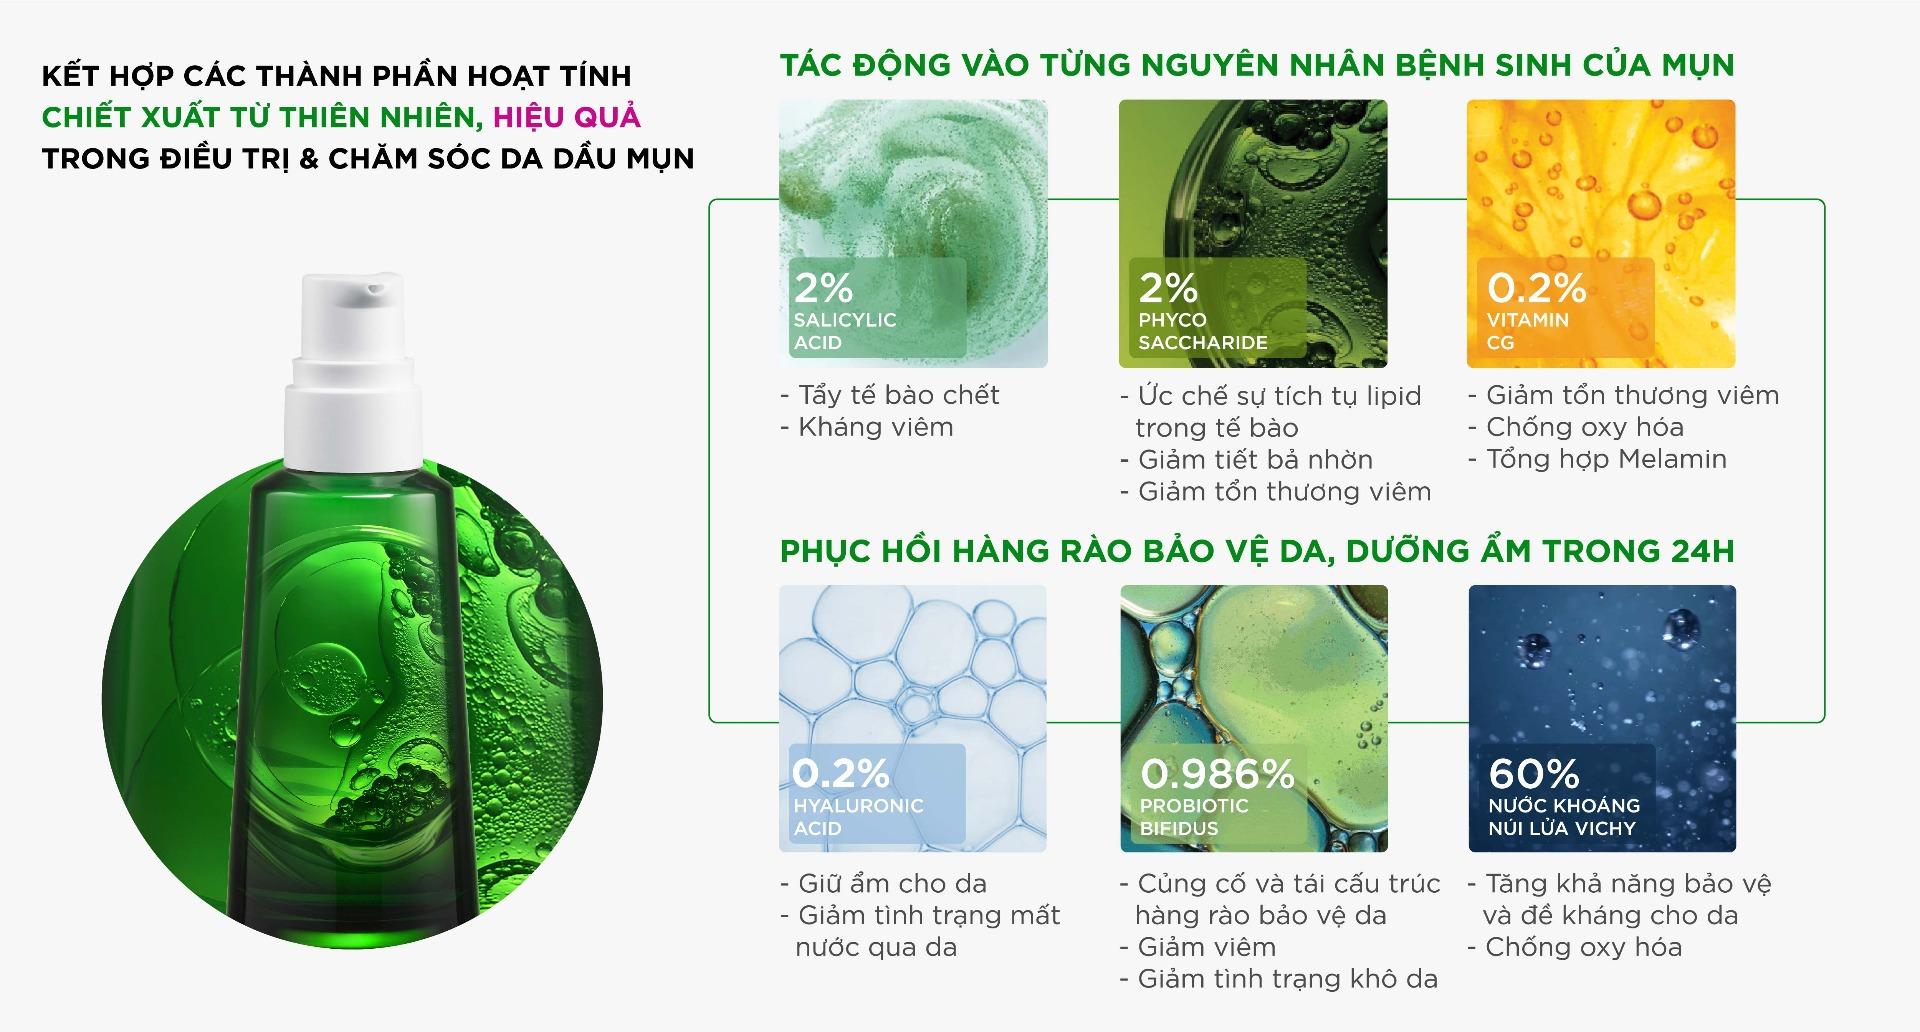 Kem Dưỡng Dạng Gel Sữa Vichy Dành Cho Da Mụn Normaderm Phytosolution Double-Correction Daily Care